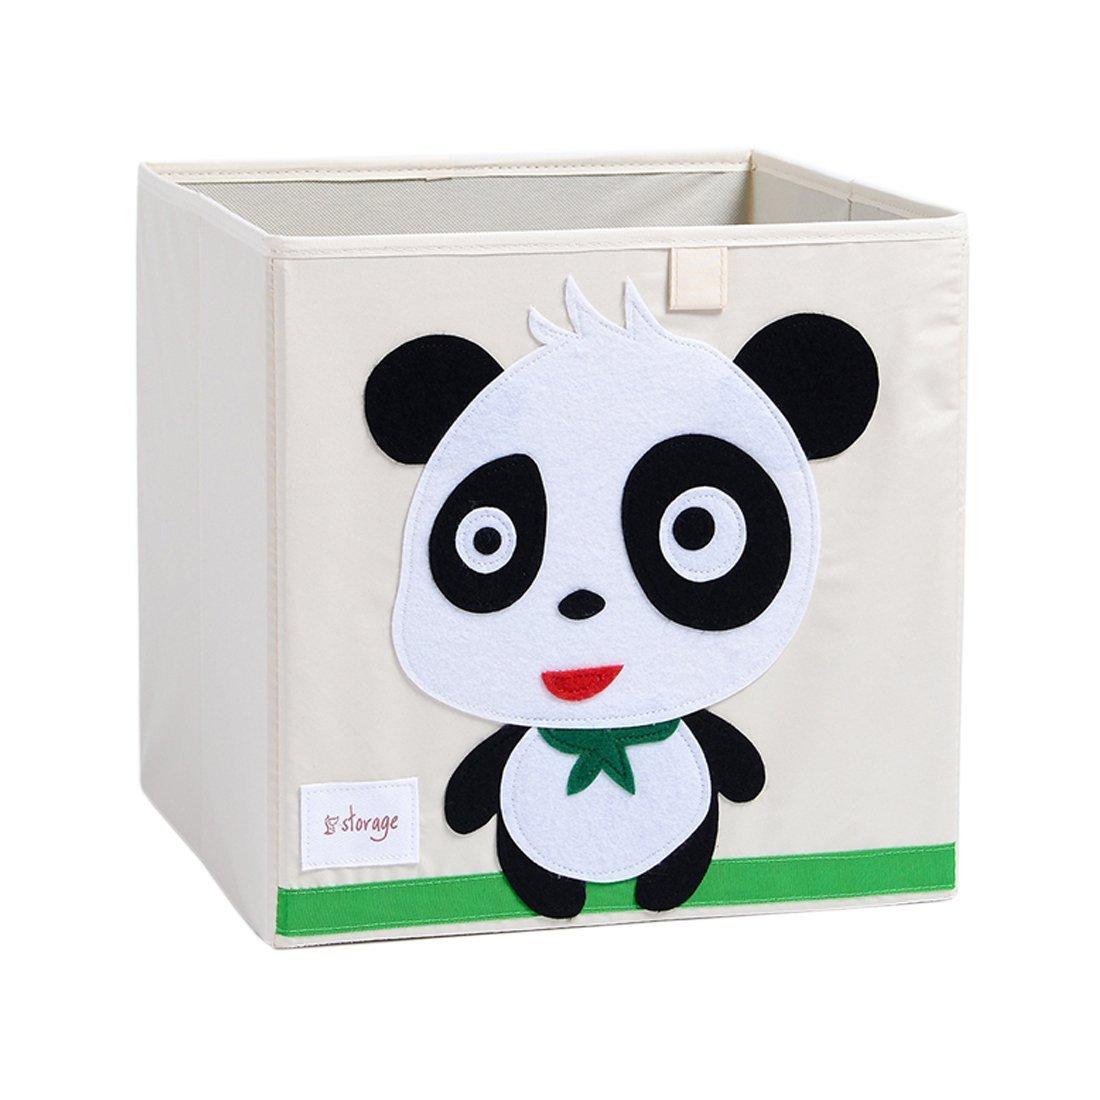 Vmotor Foldable Animal Canvas Storage Toy Box/Bin/Cube/Chest/Basket/Organizer For Kids, 13 inch(Panda)